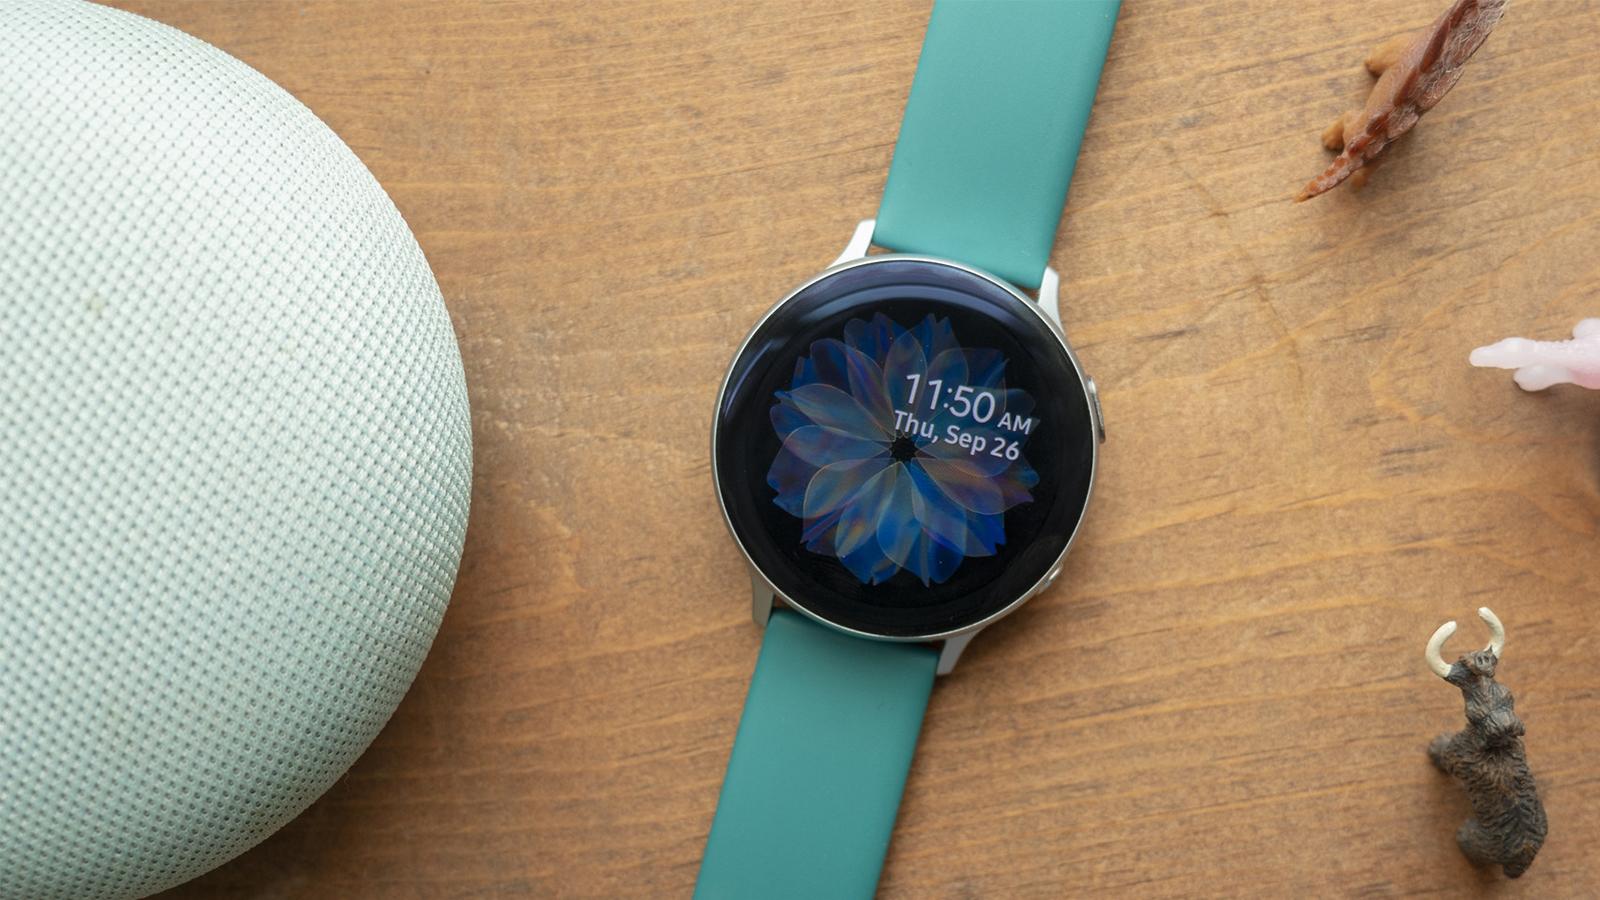 Galaxy watch active 2 brasil